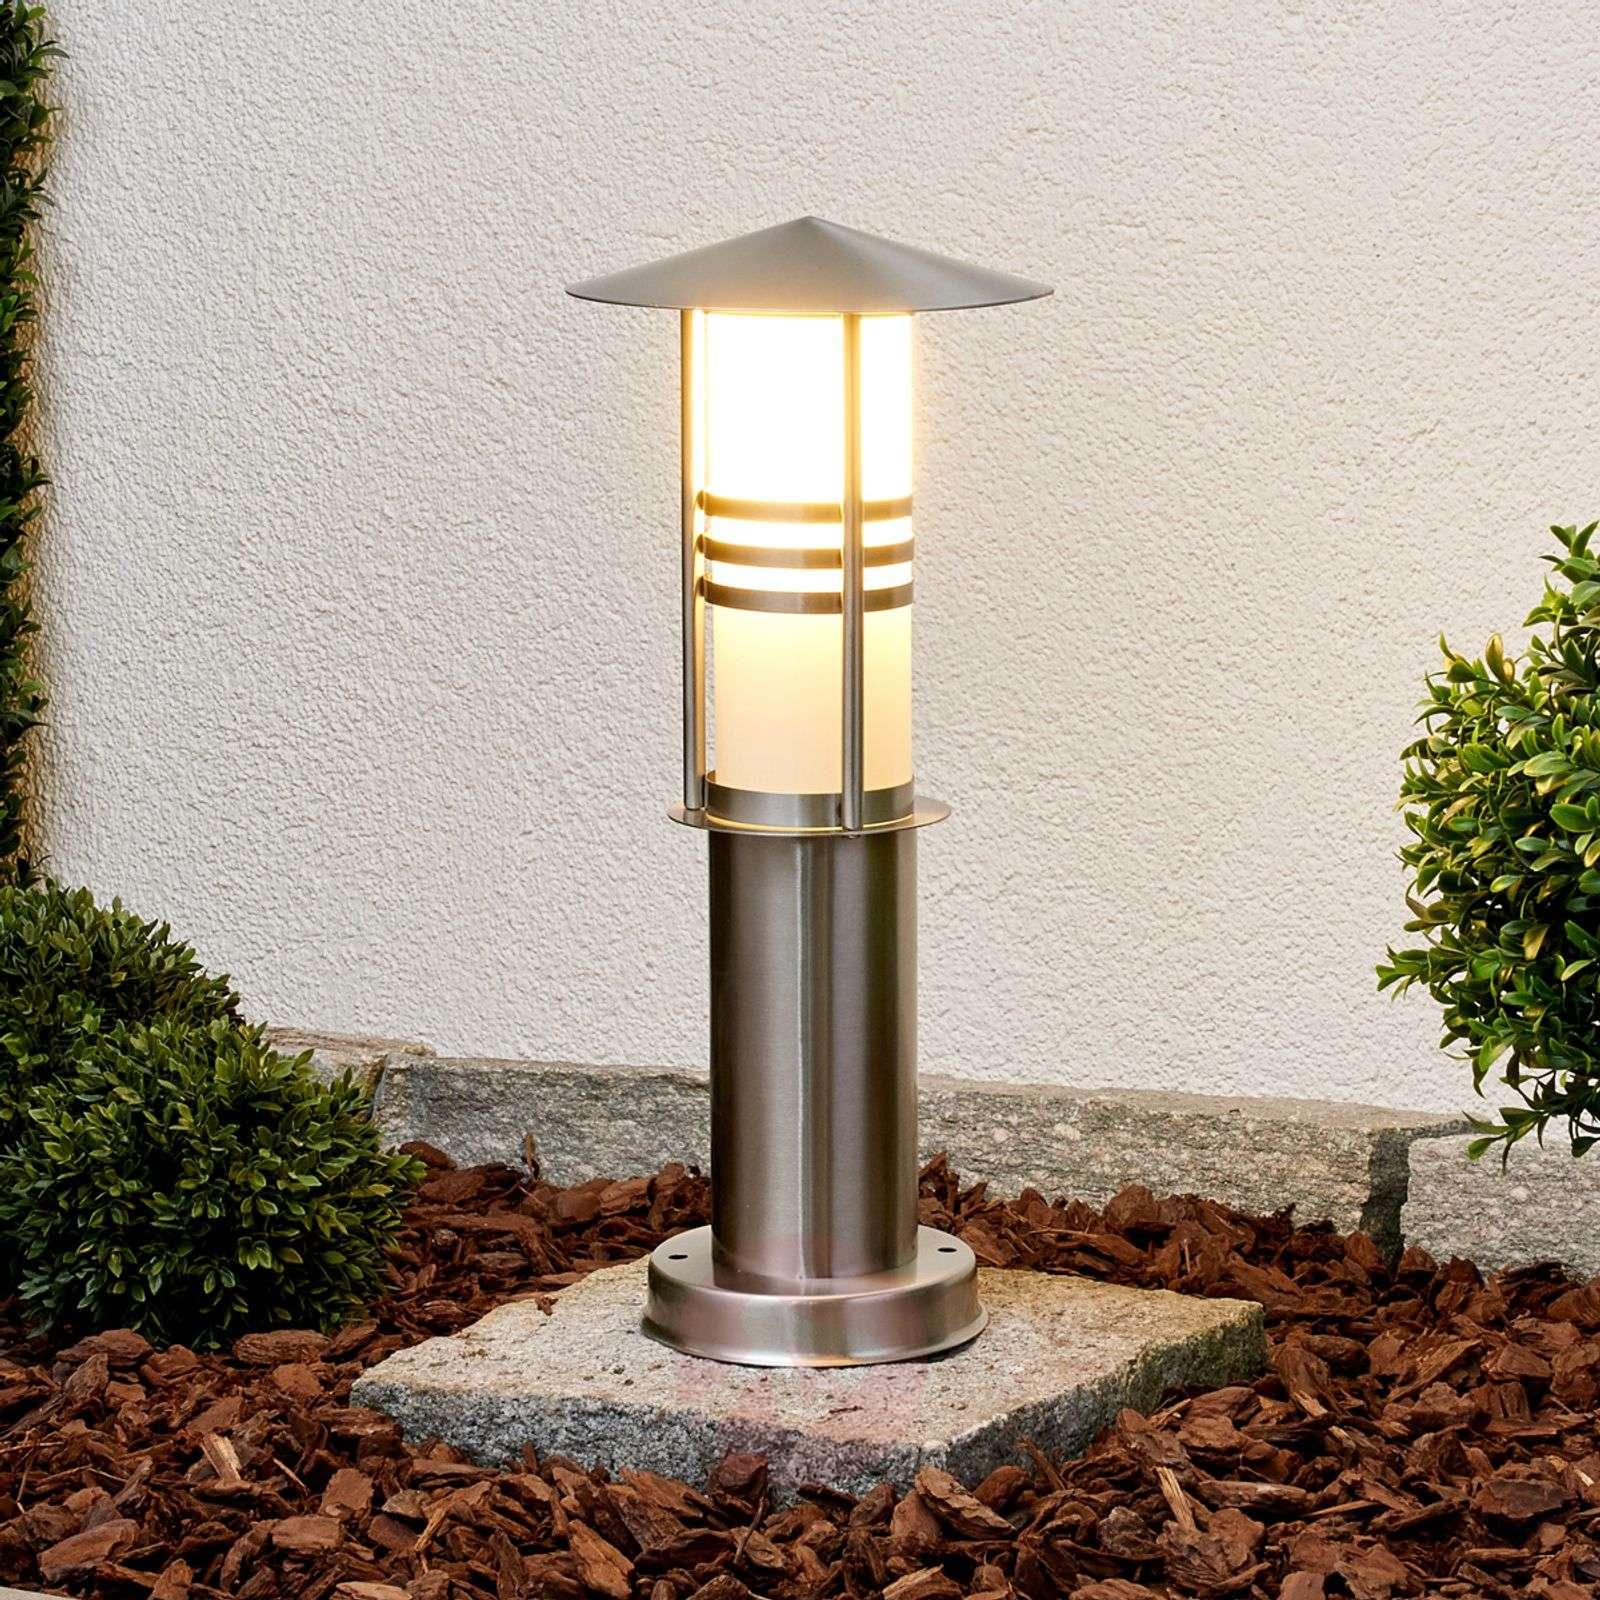 Decorative Erina stainless steel pillar light-9960030-01